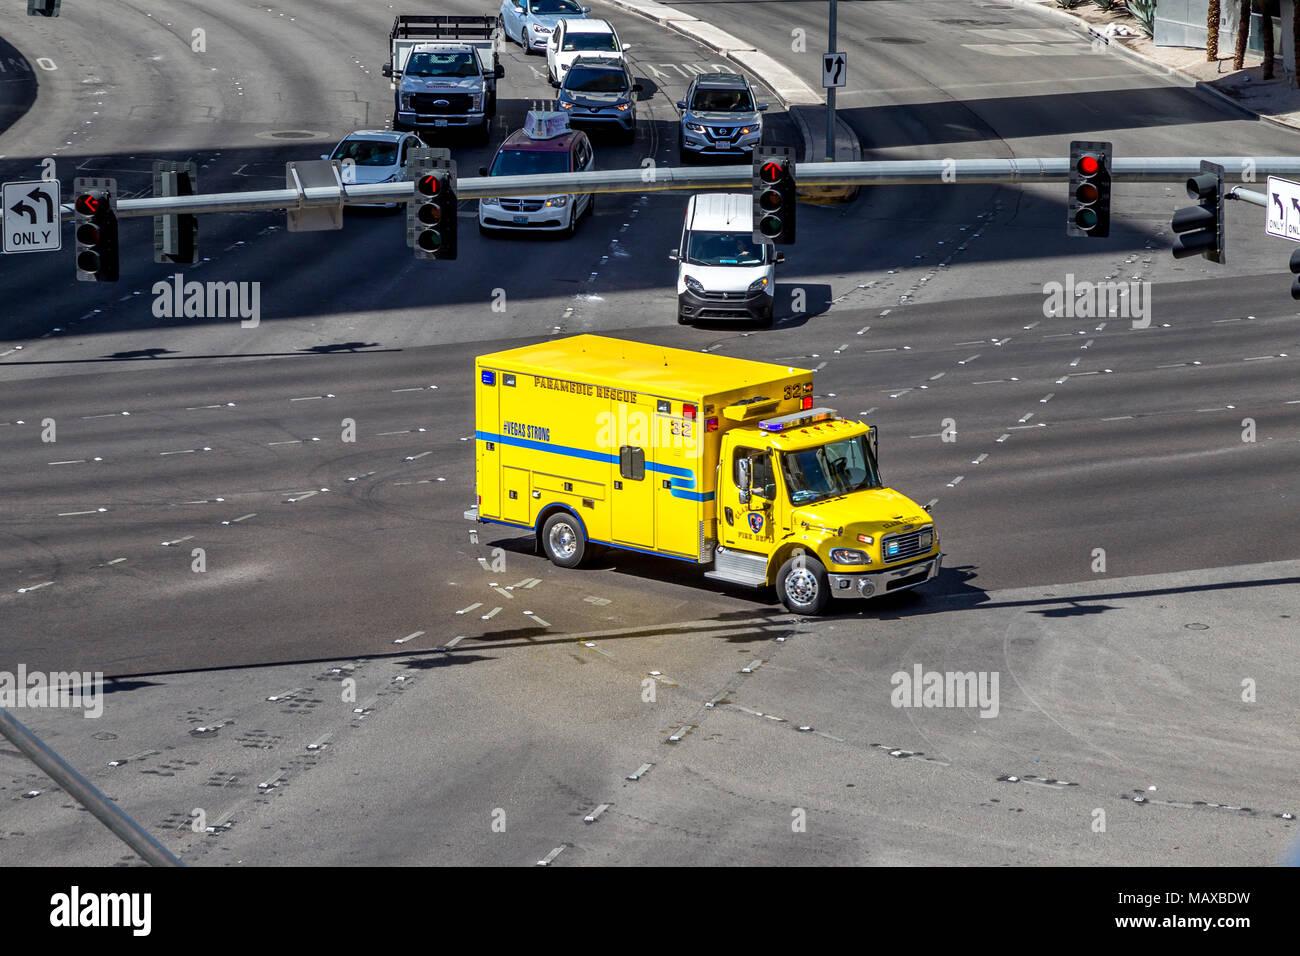 Clark County Fire deparments Paramedic Rescue, Las Vegas, Narvarda, U.S.A. - Stock Image